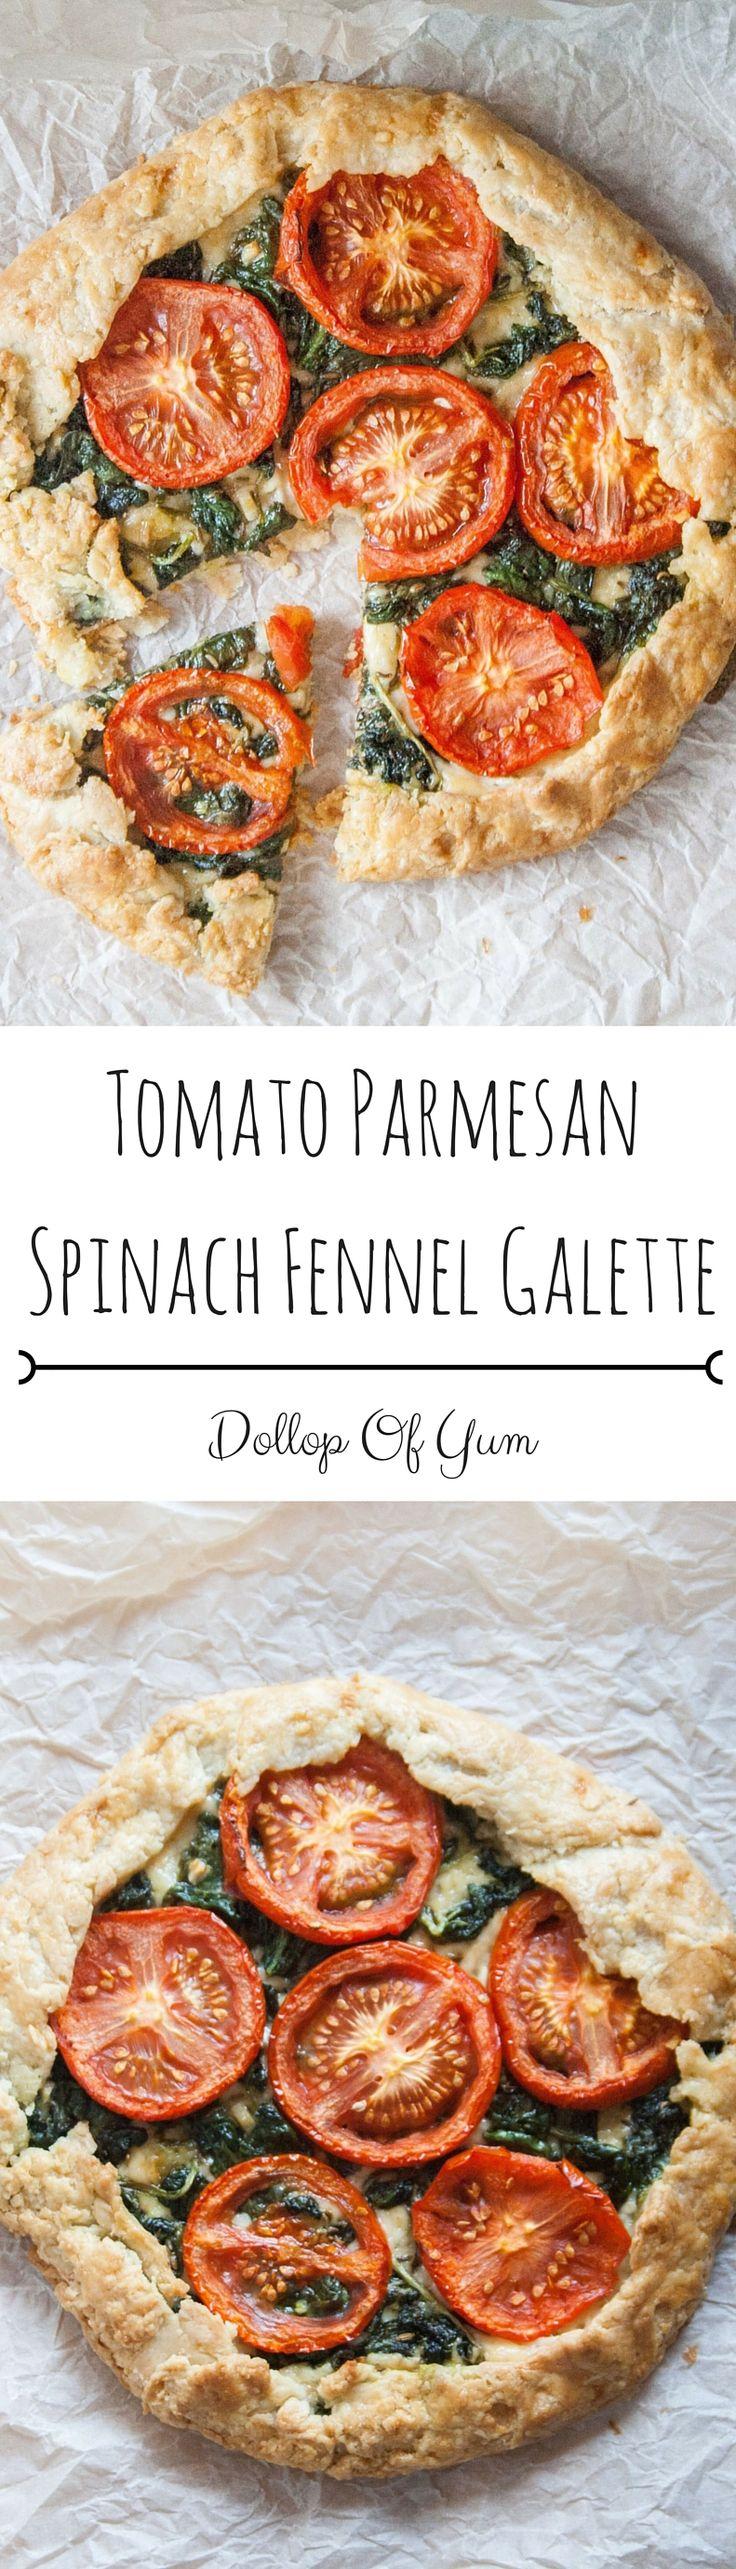 Tomato Parmesan Spinach Fennel Galette